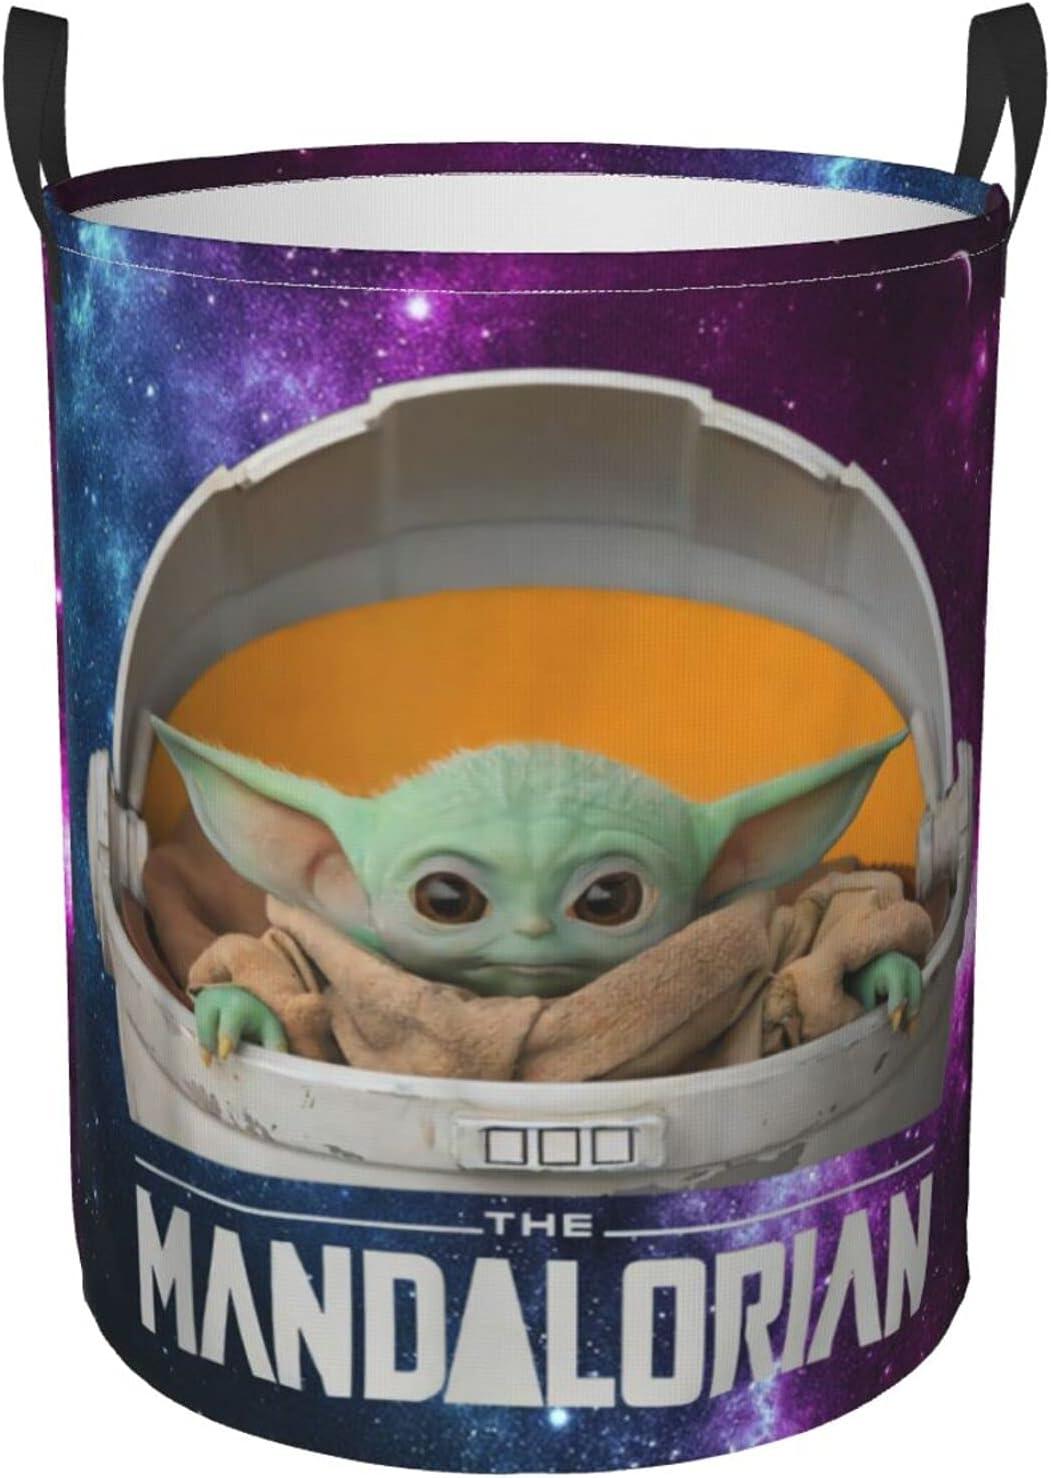 COCOCHILLA Mandalorian Baby Yoda Classic Translated Laundry Storage Collapsi Hamper